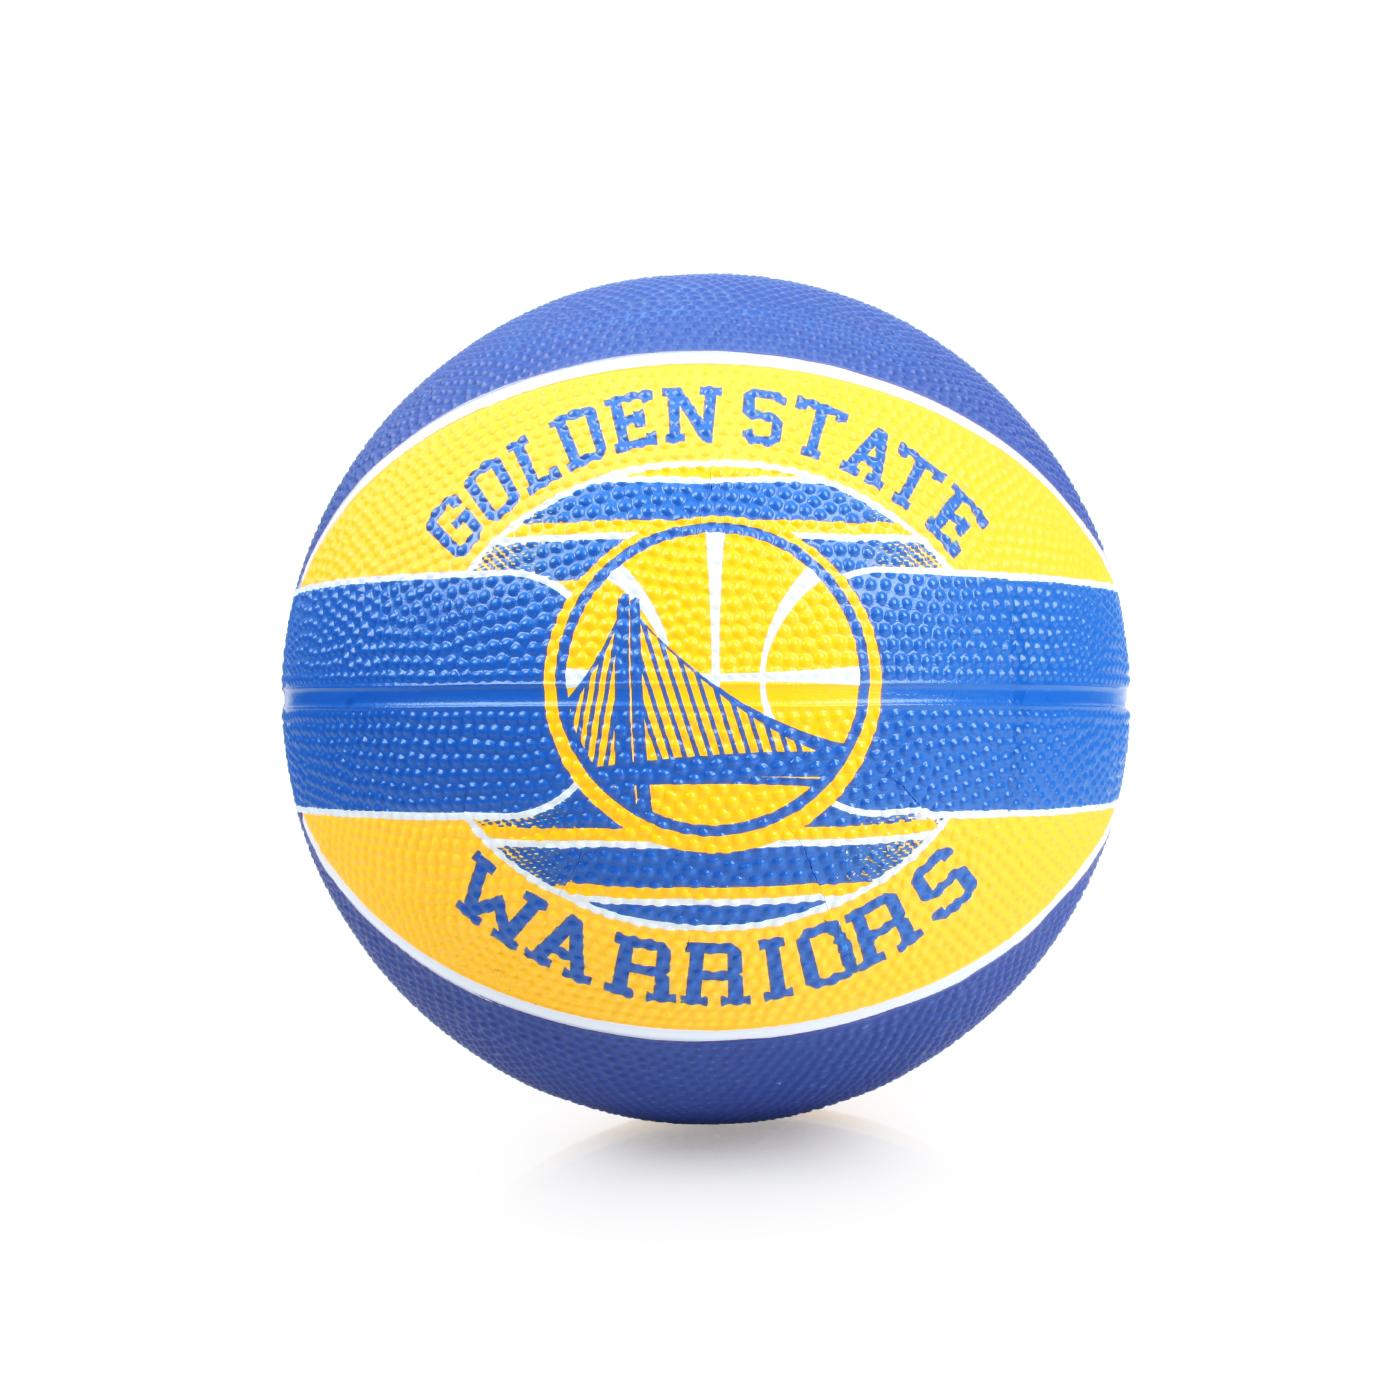 SPALDING 兒童-勇士 Warriors SZ3 籃球 SPA83617 - 藍黃